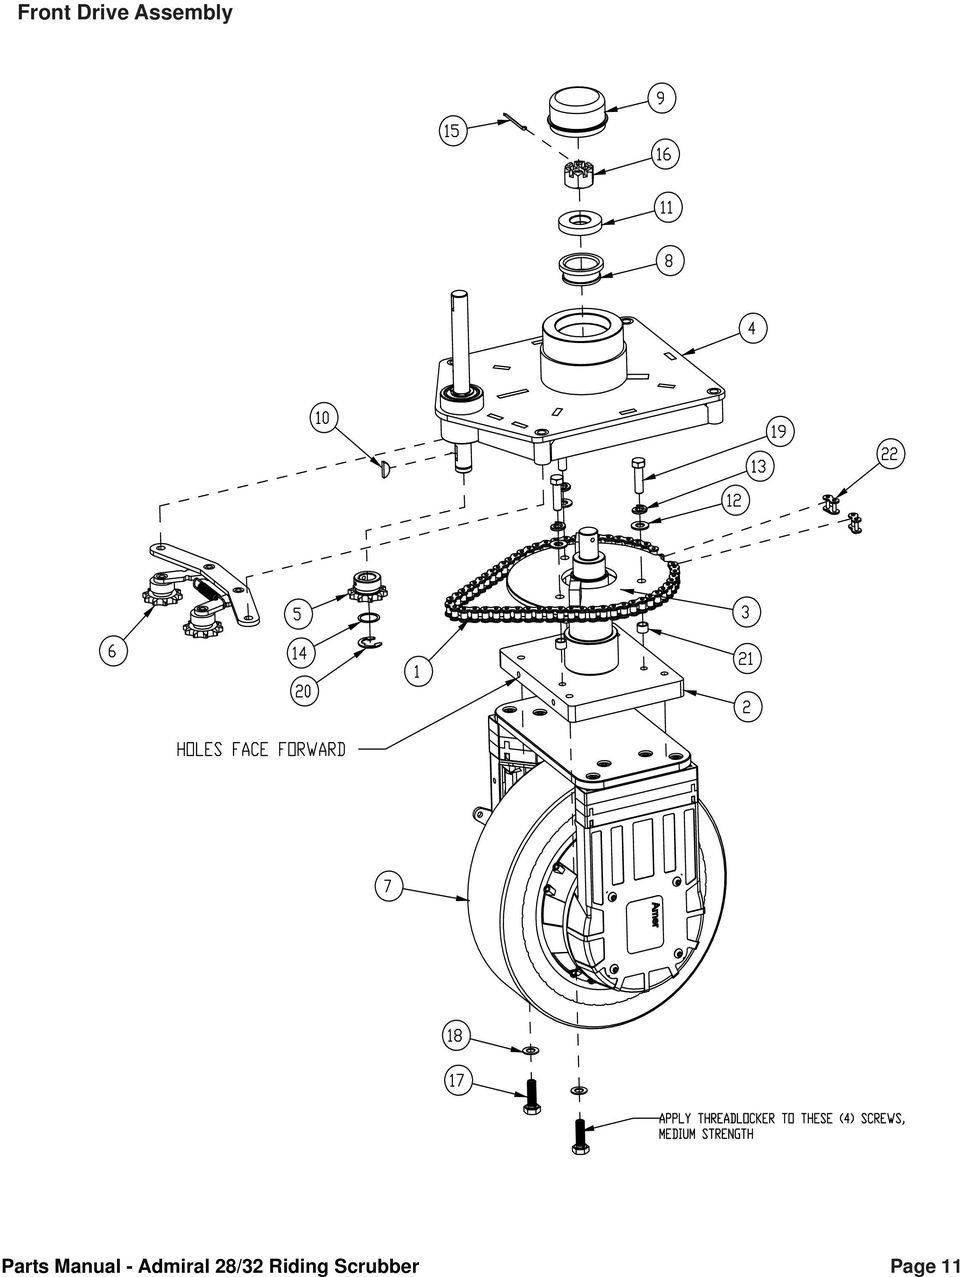 admiral dryer wiring diagram Download-Admiral Dryer Parts Diagram Luxury Admiral 28 32 Riding Scrubber Pdf 3-m